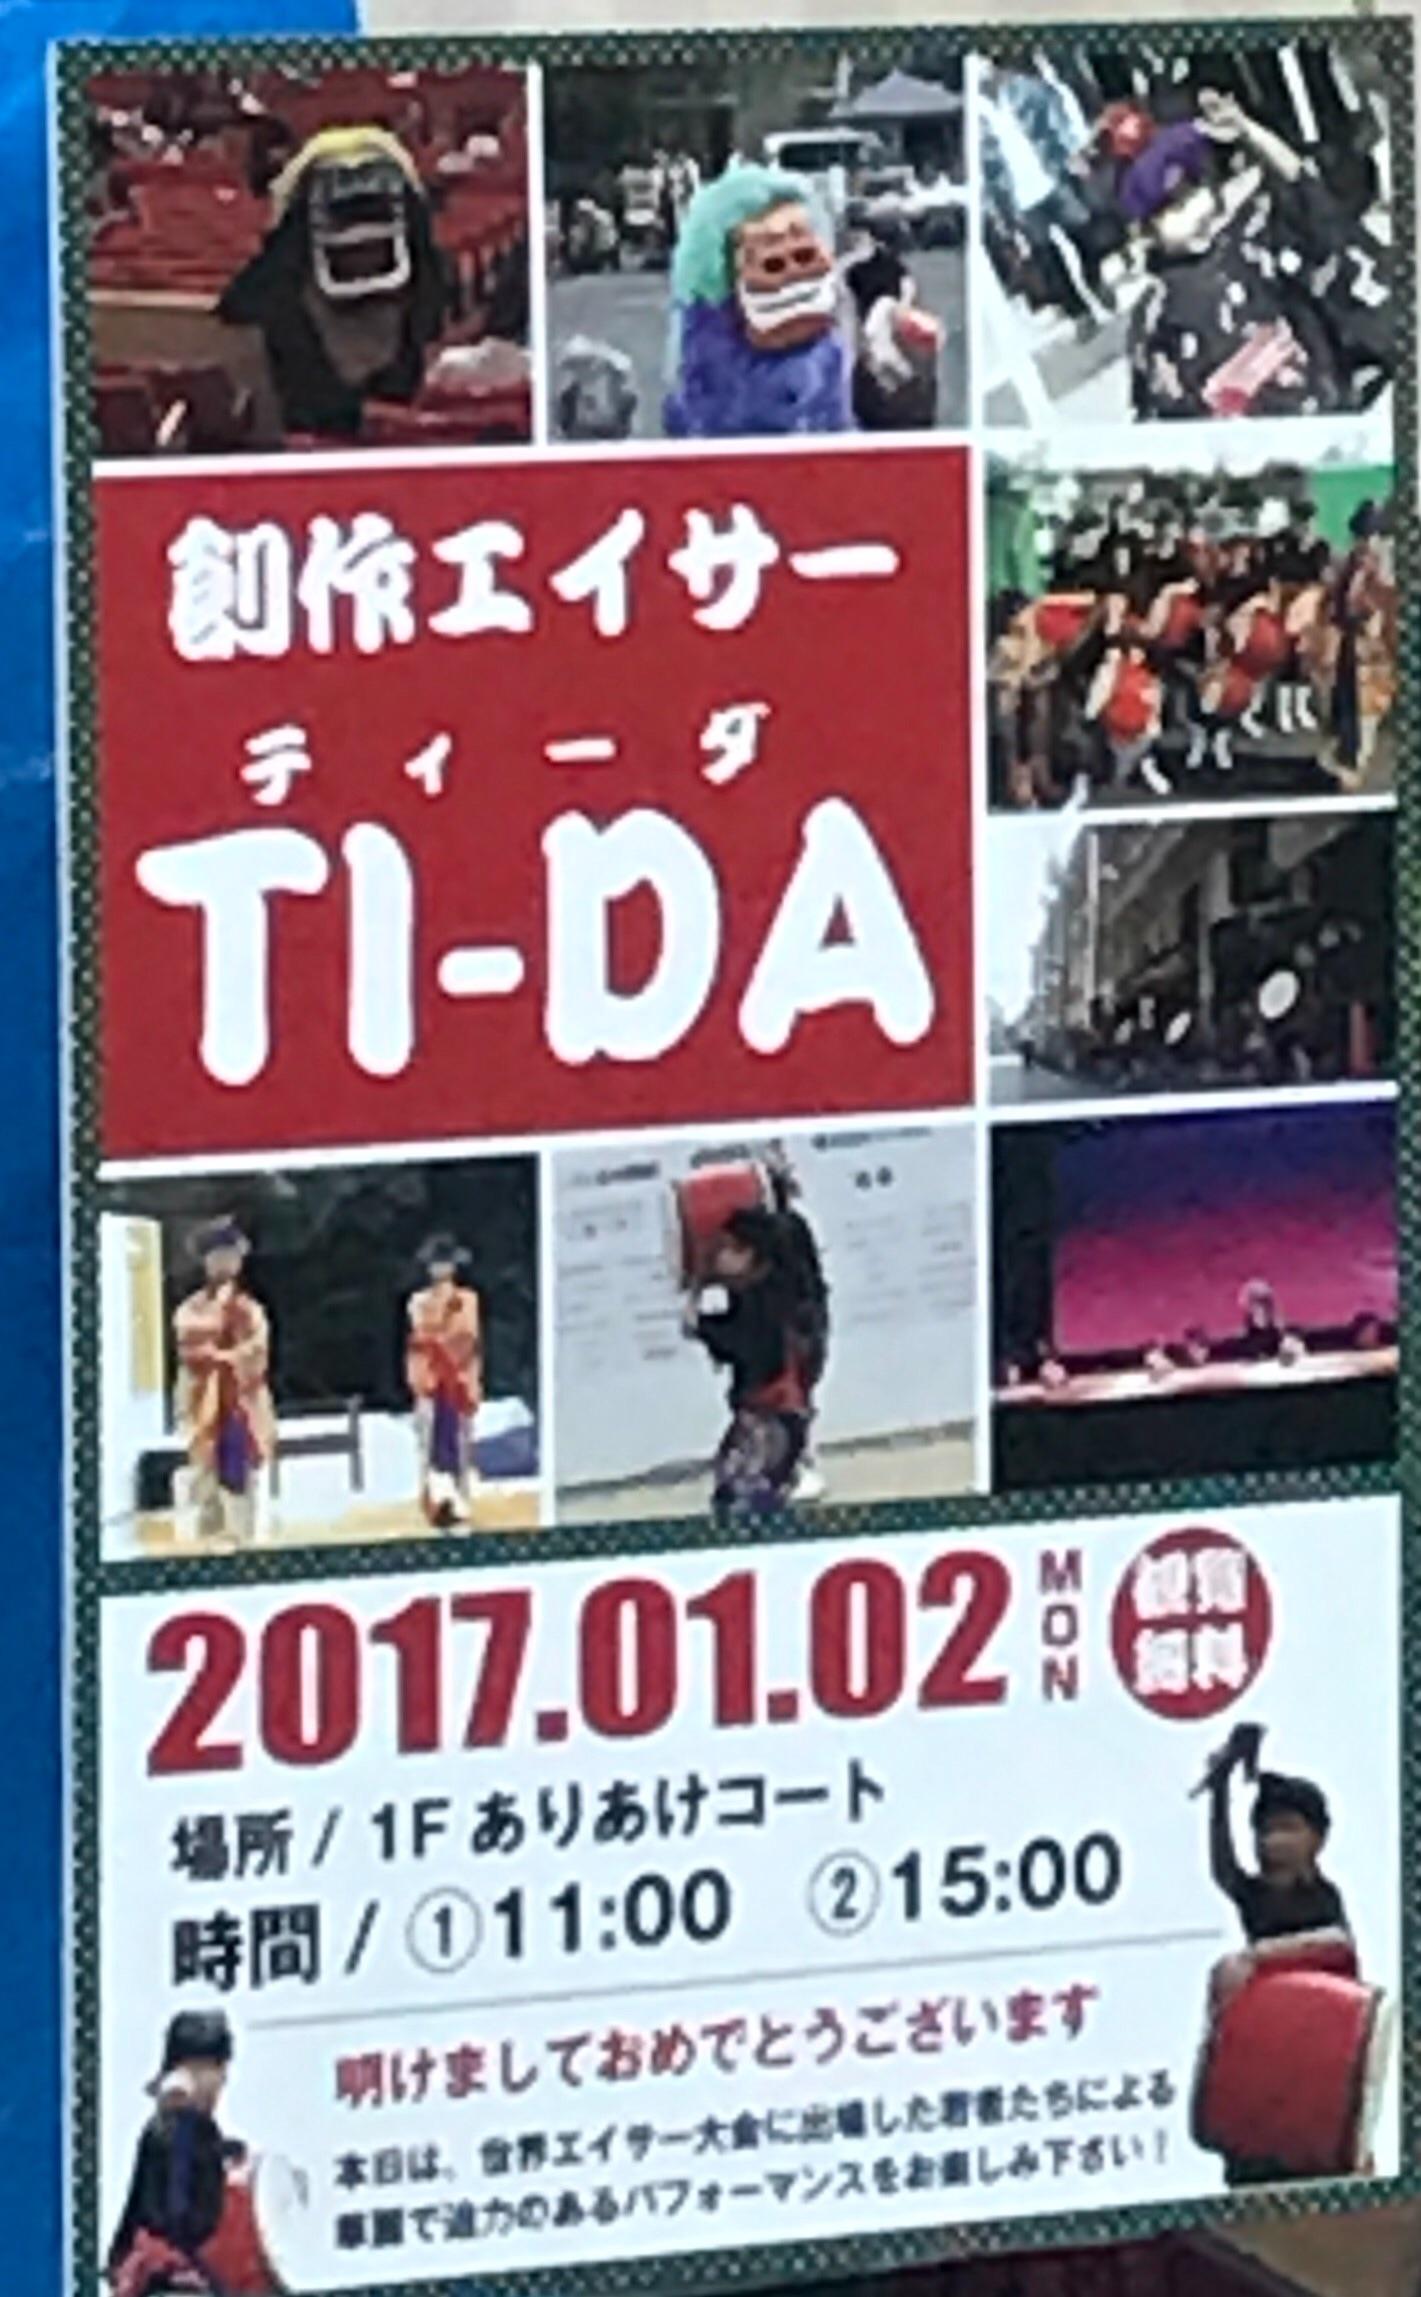 f:id:ti-da0410:20170102211925j:image